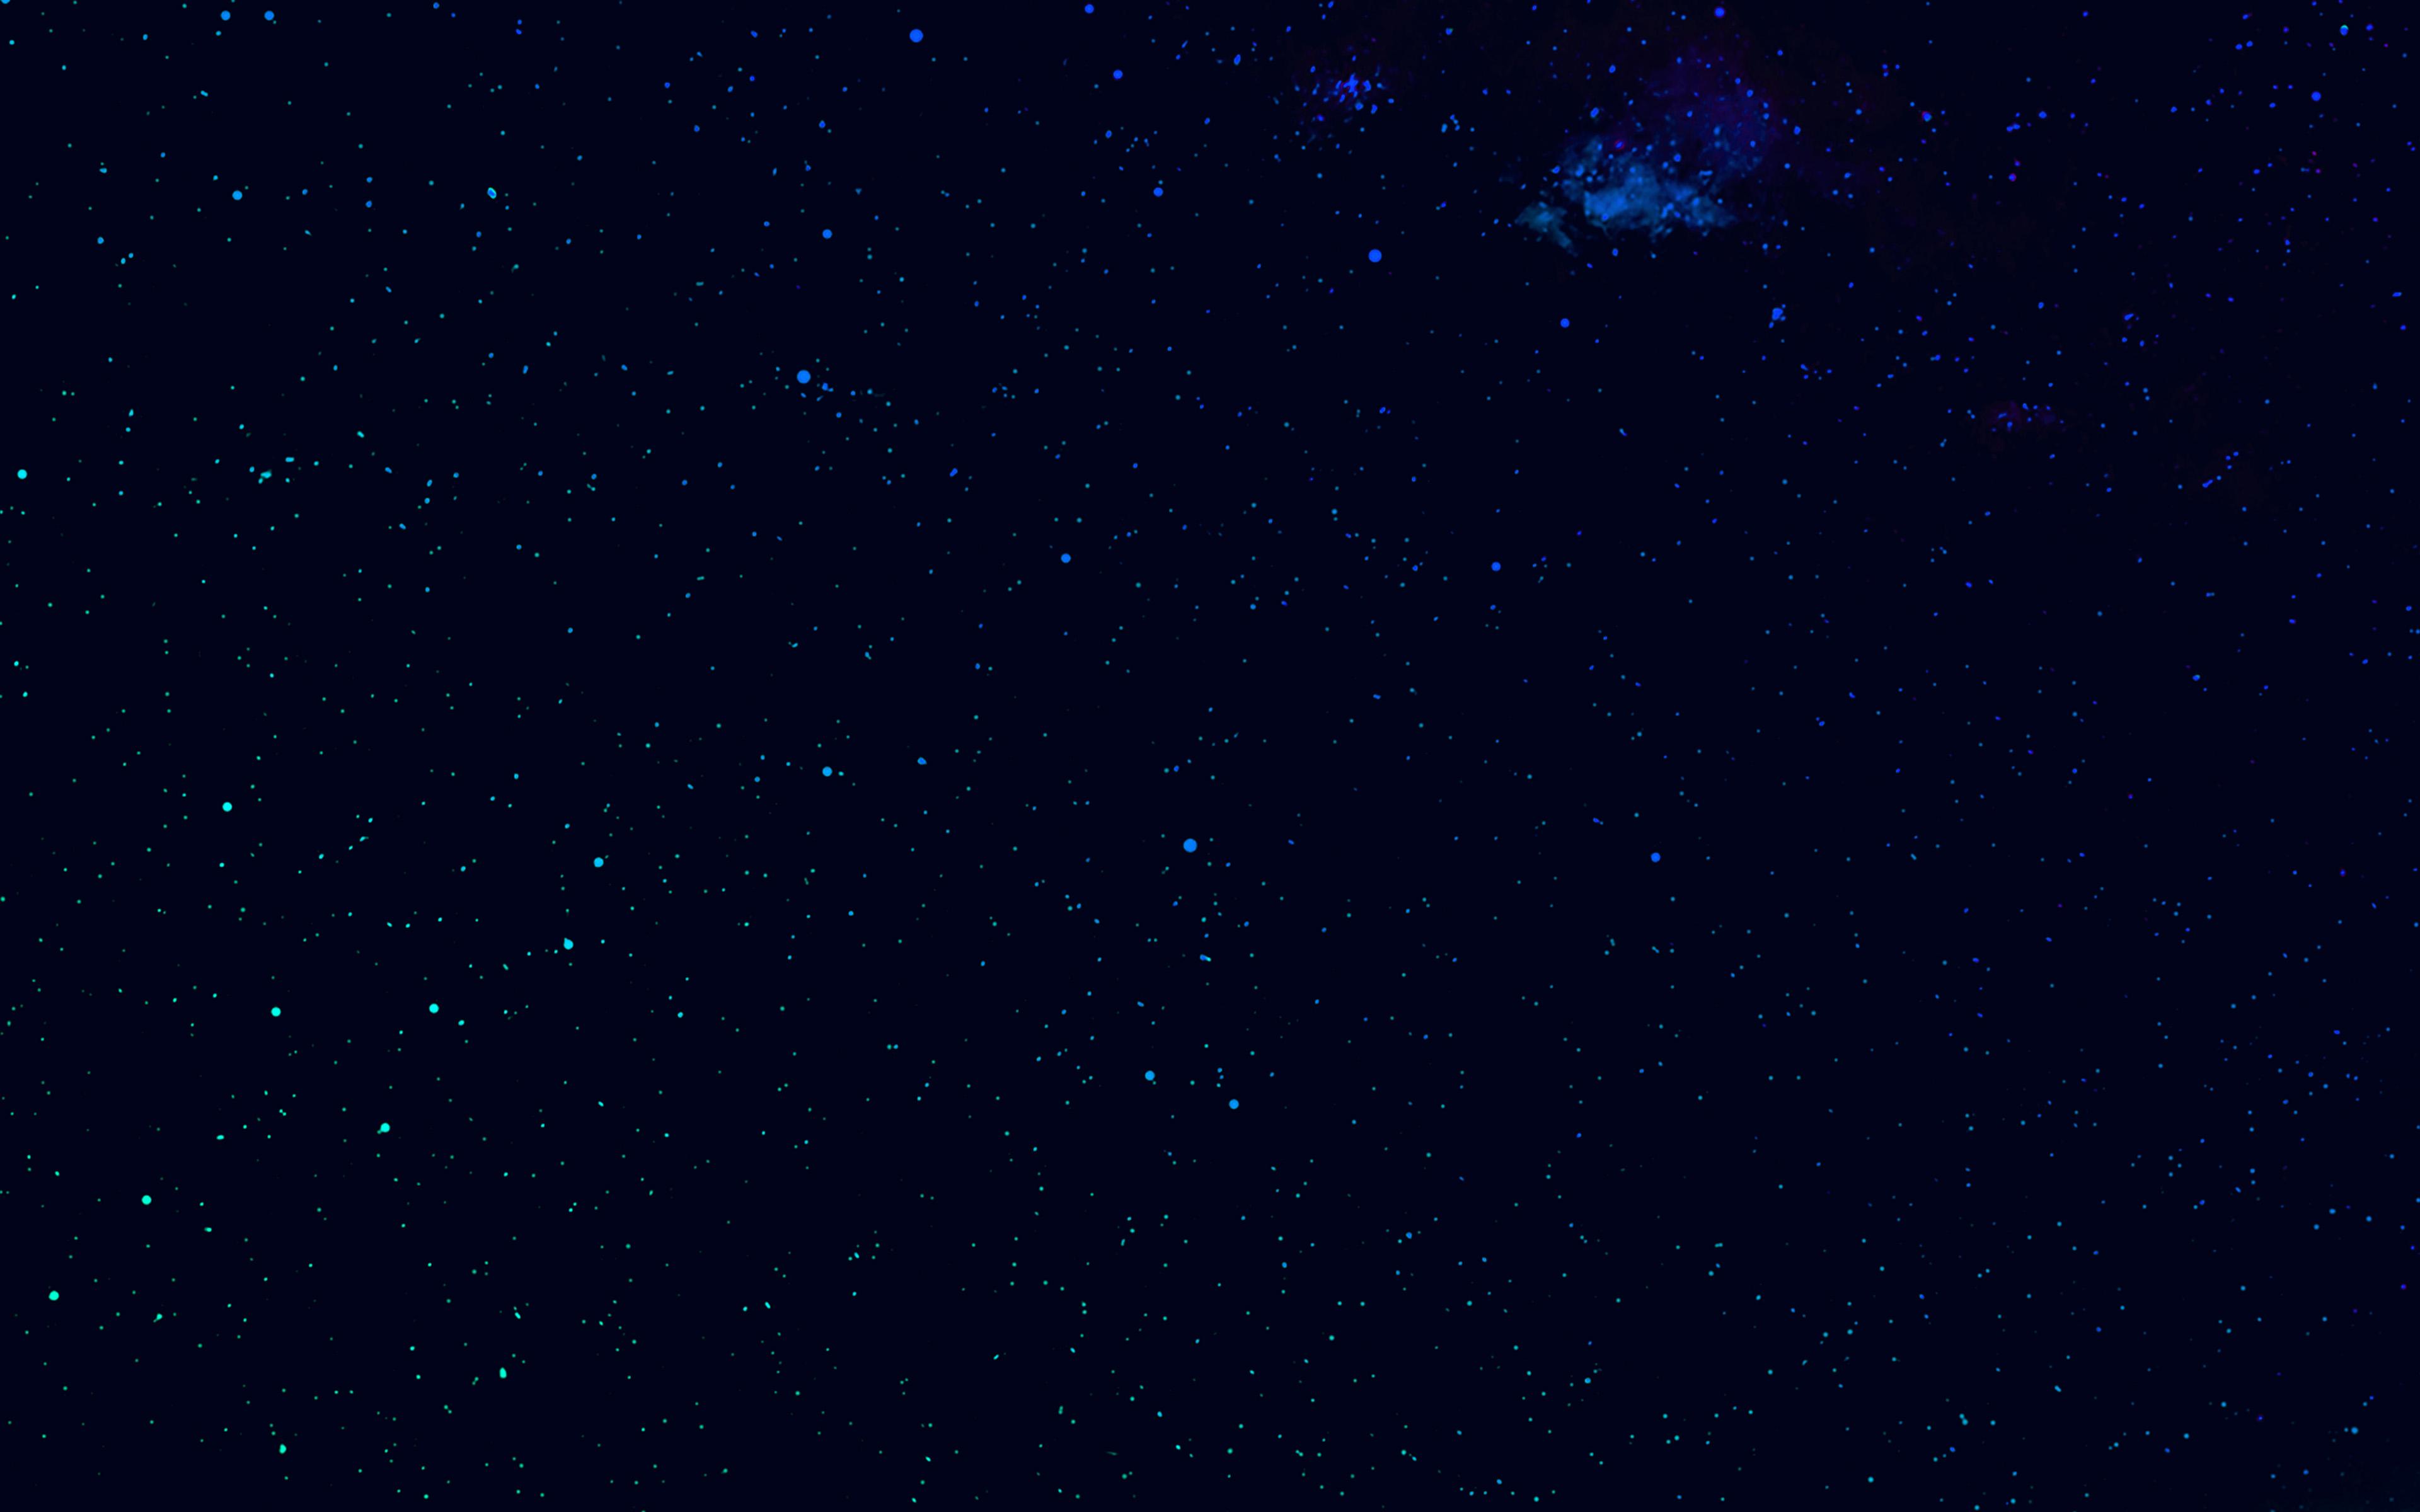 Mx26 Night Sky Star Space Galaxy S6 Nature Blue Wallpaper